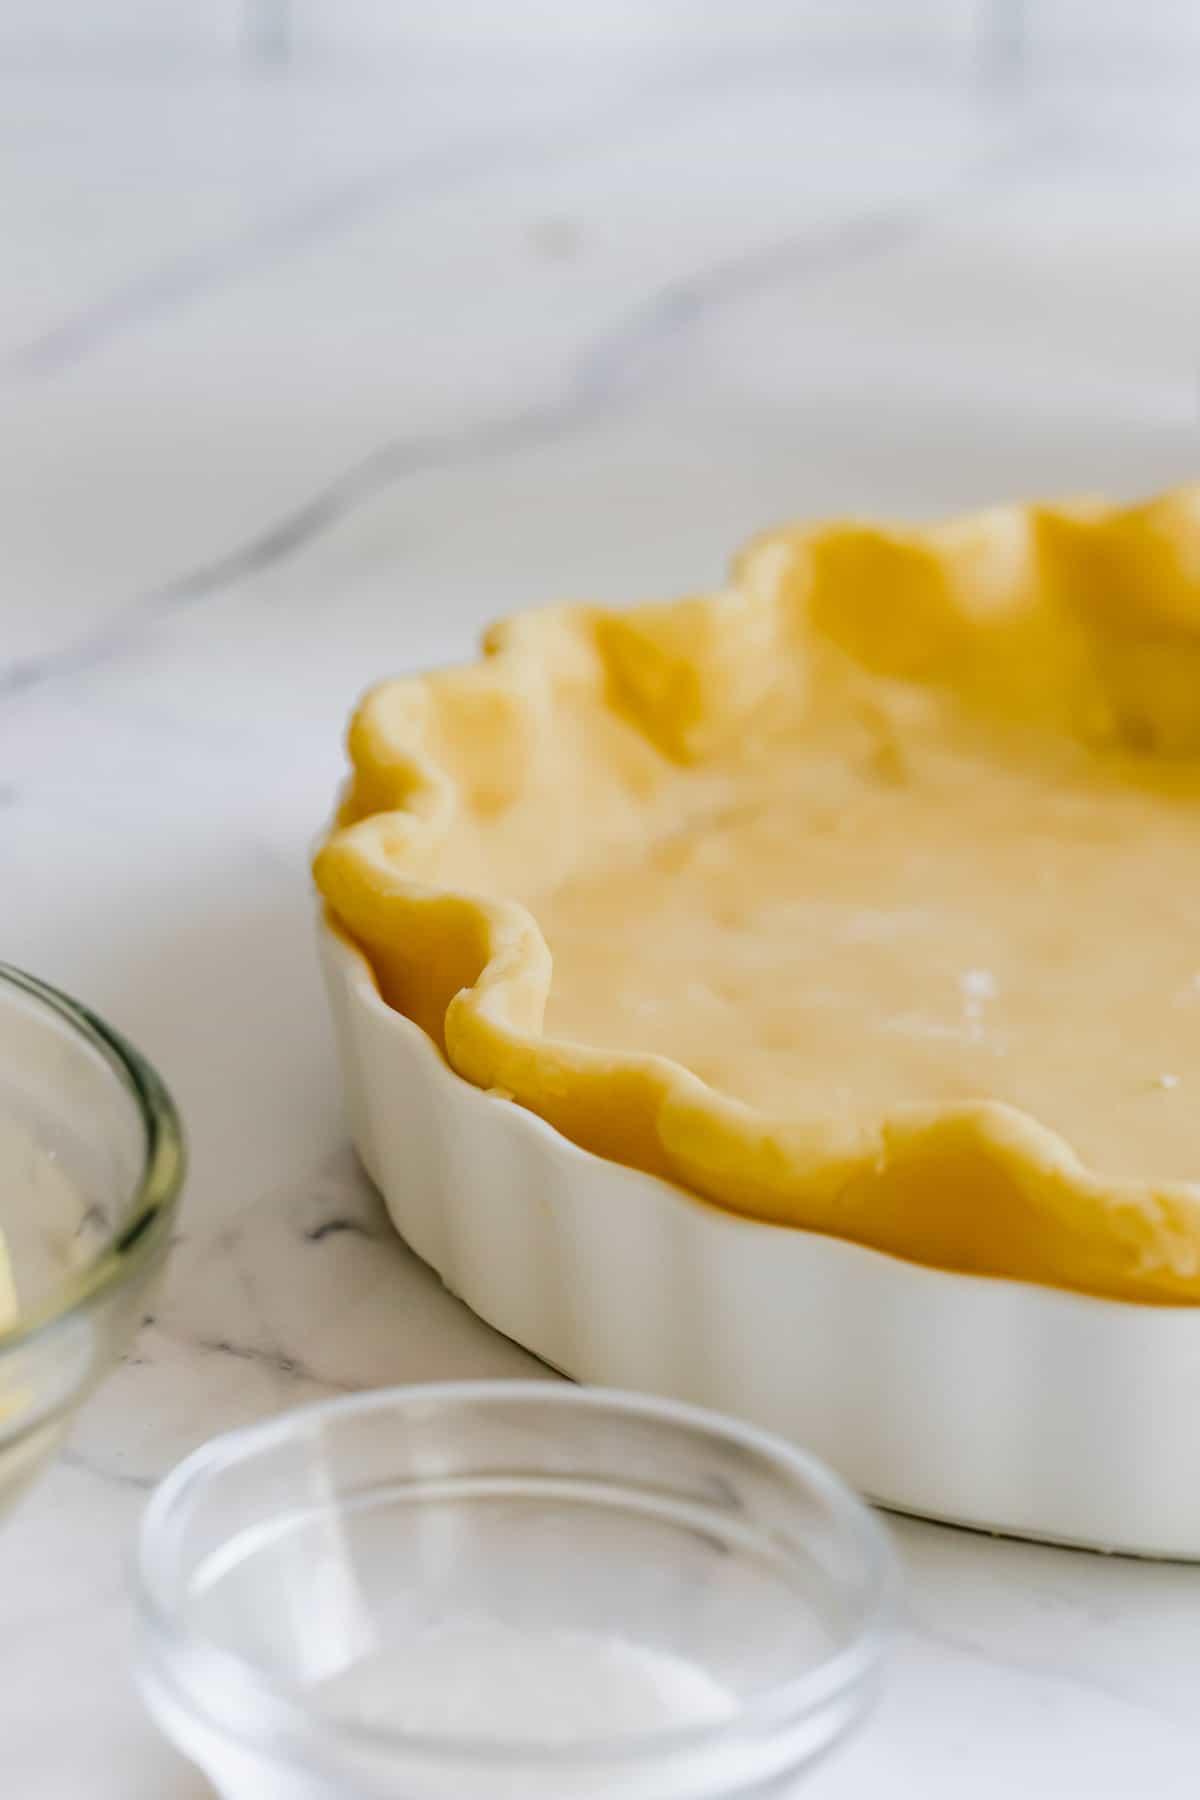 A Close-Up Shot of a Buttery Pie Crust Made from Scratch